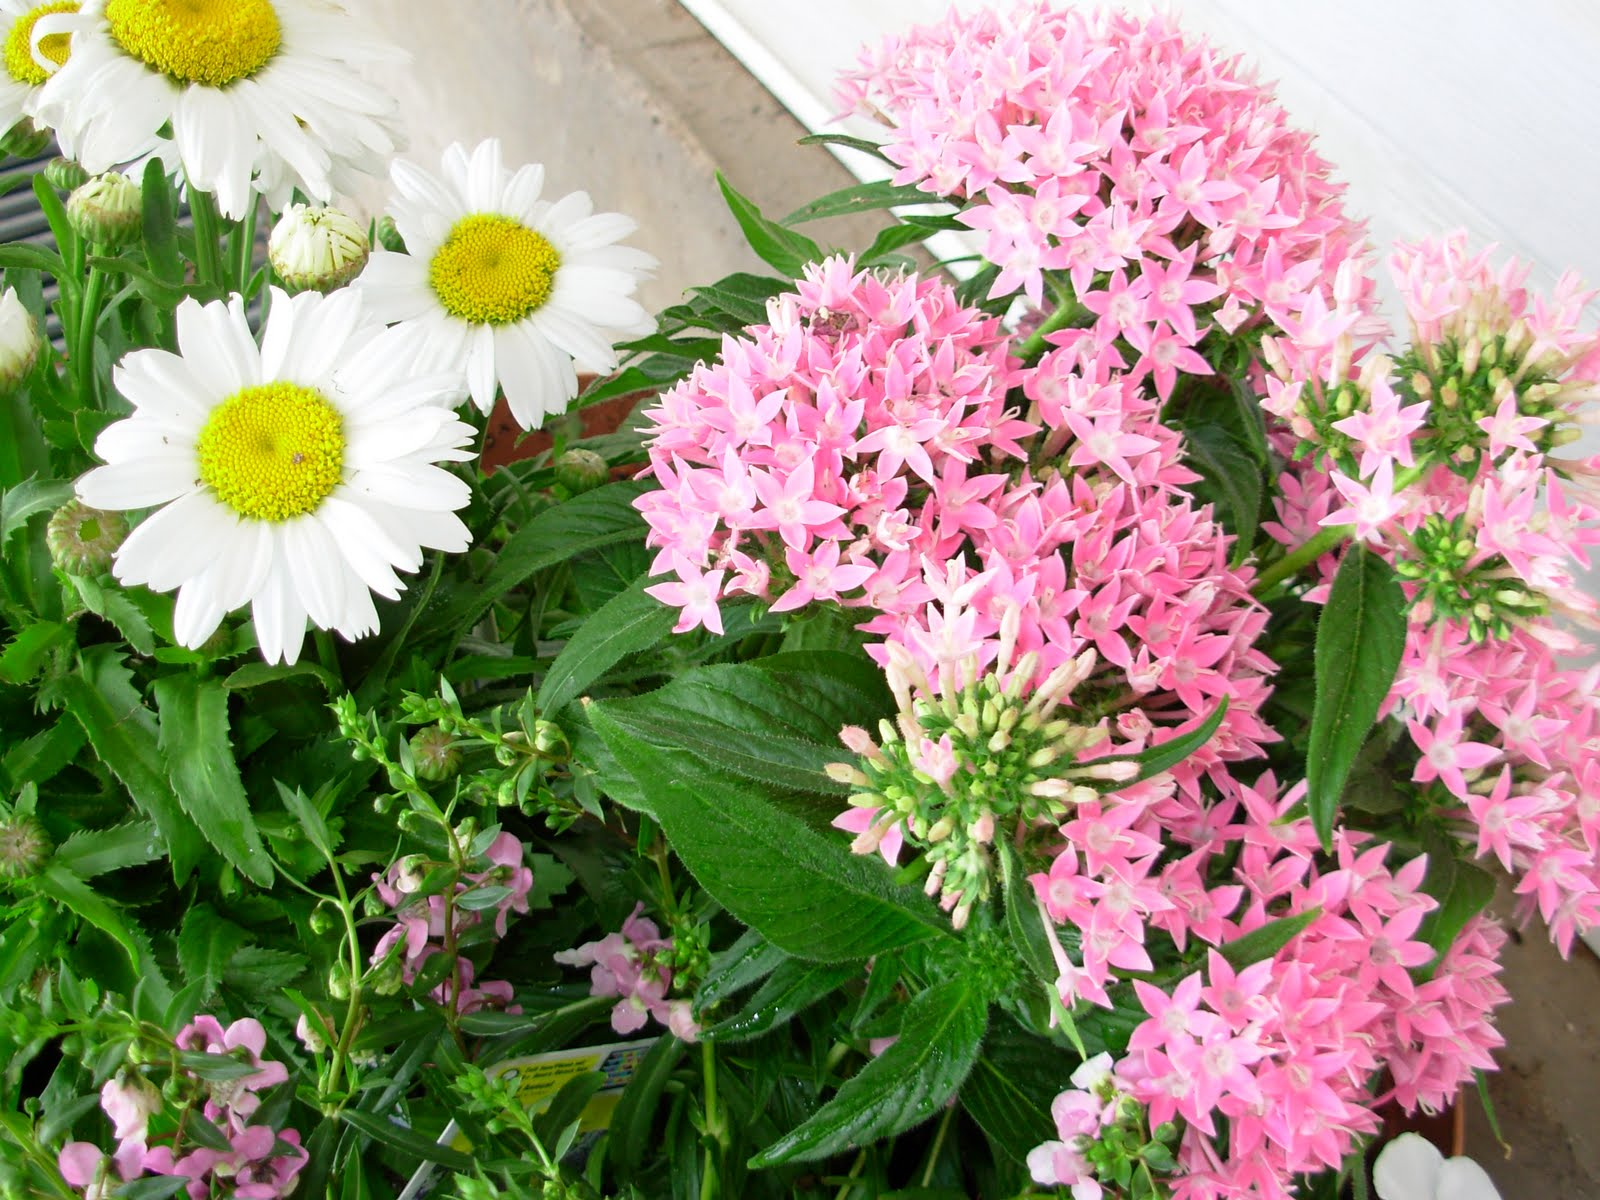 Senseless Ramblings Of The Mindless Planted My Flowers